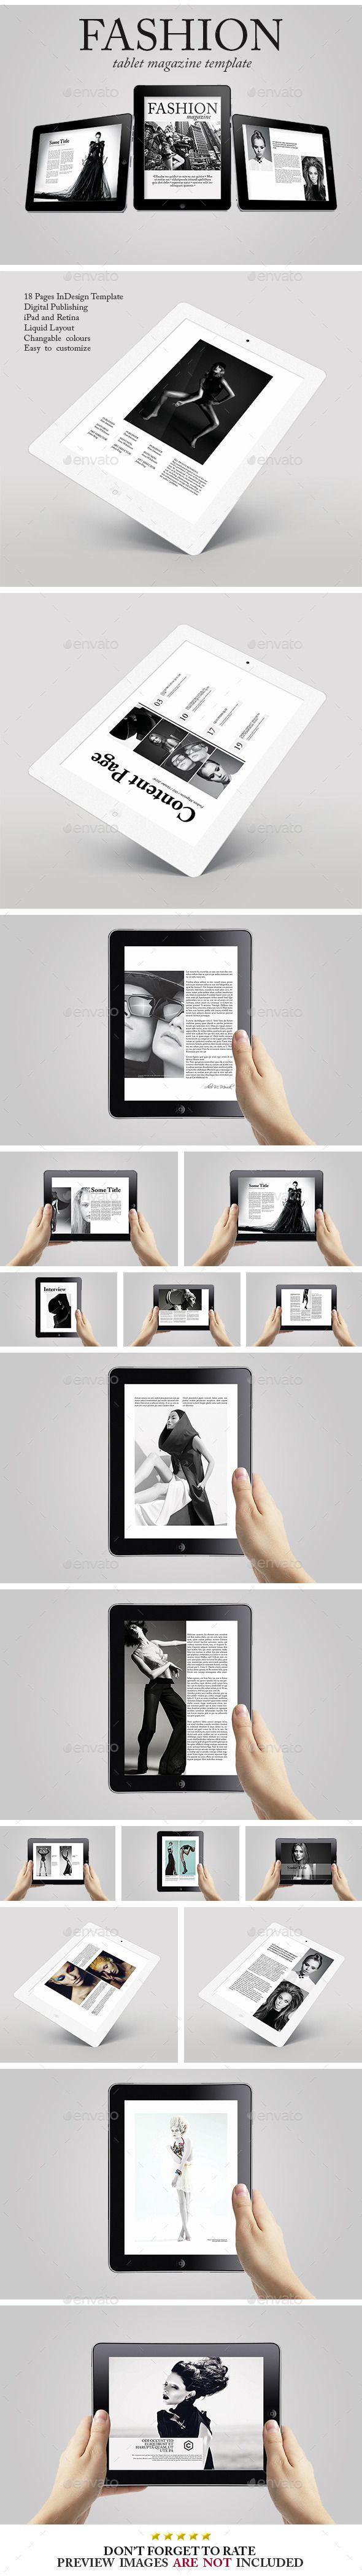 Tablet Fashion Magazine Template